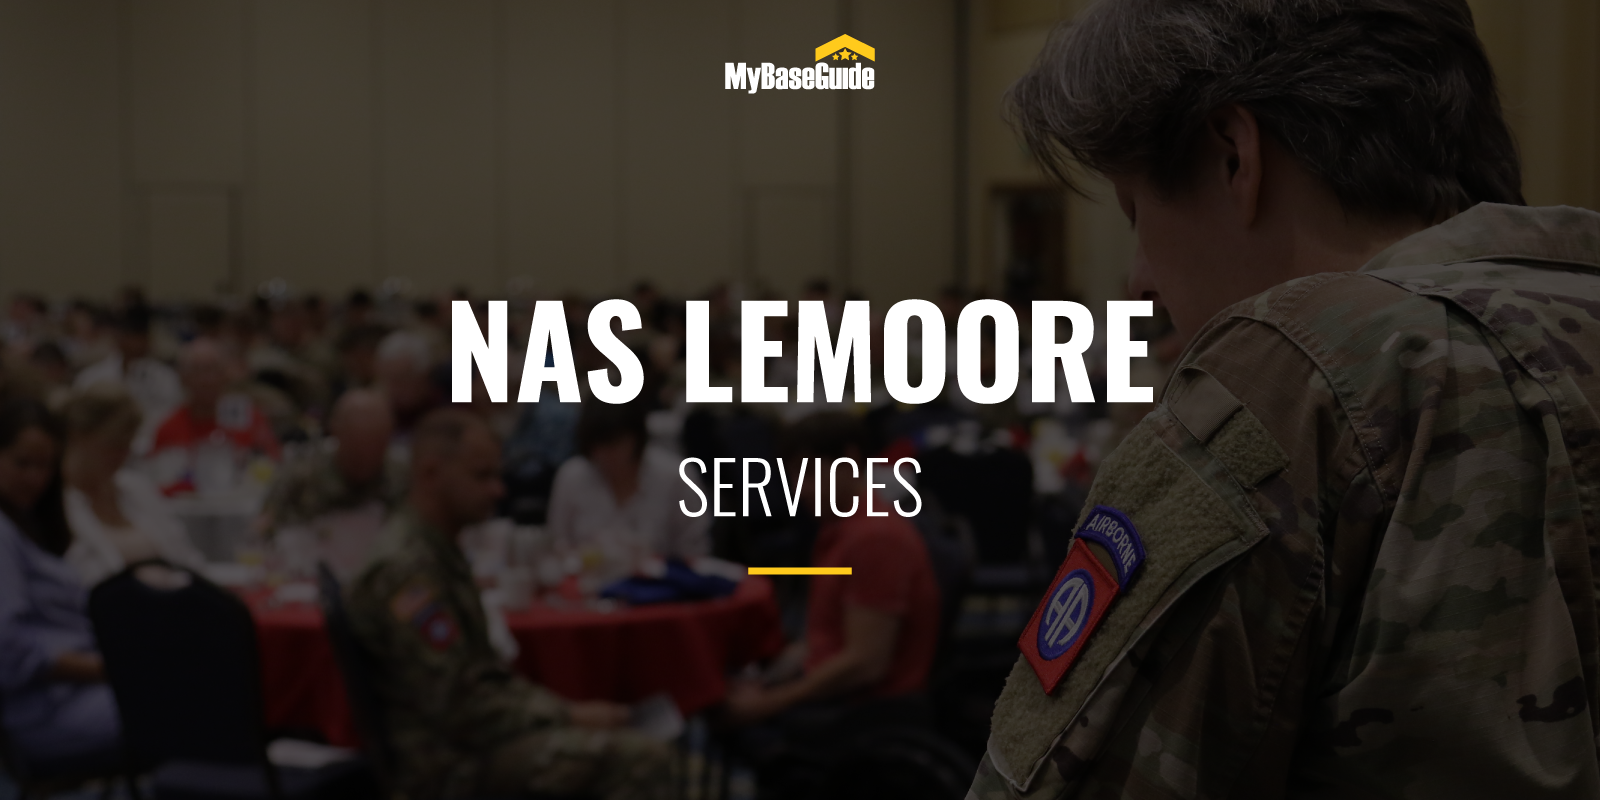 NAS Lemoore Services